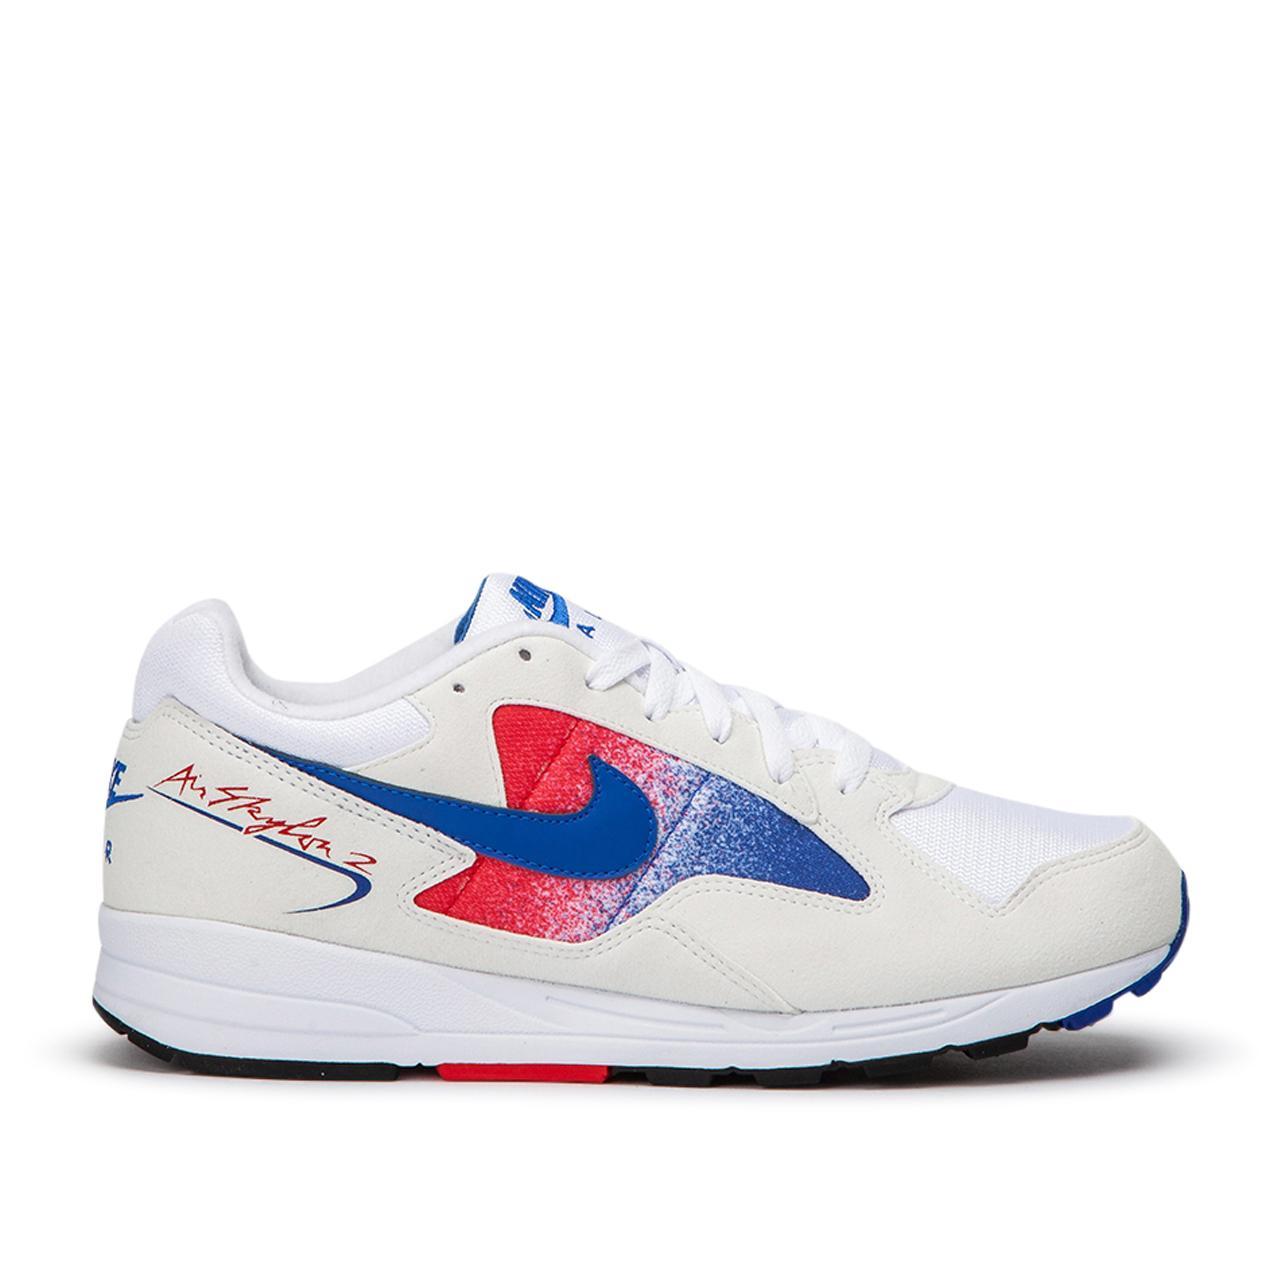 finest selection 2f958 afa61 ... Nike Air Skylon Ii for Men - Lyst. View fullscreen